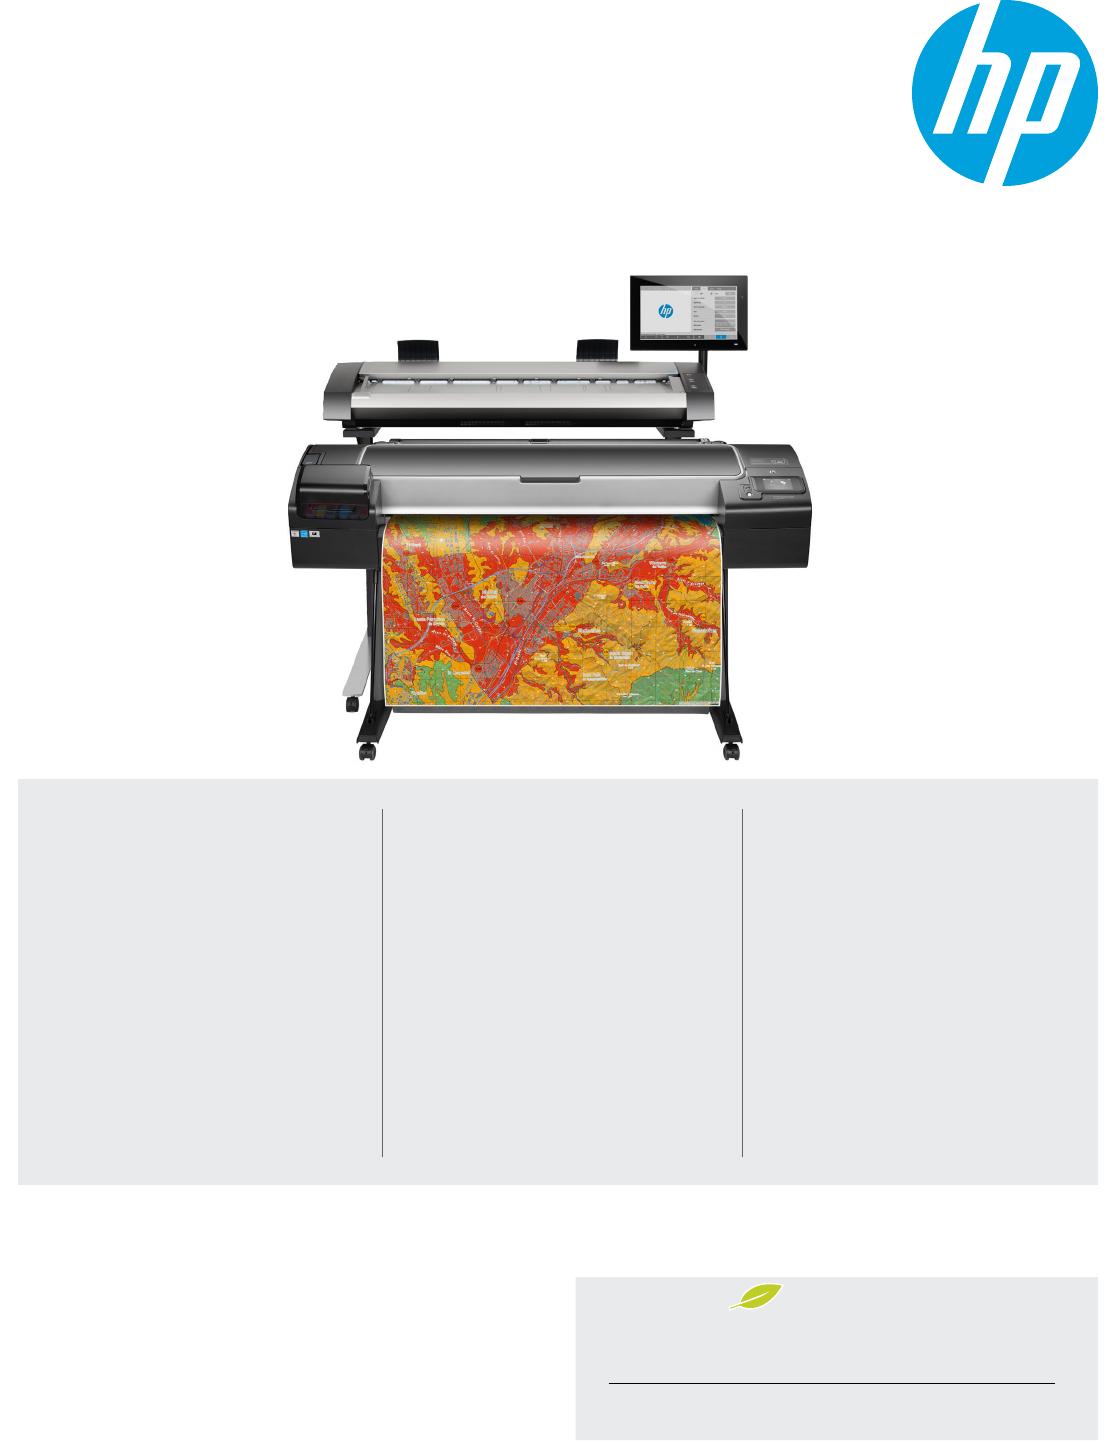 Data sheet HP DesignJet HD Pro MFP